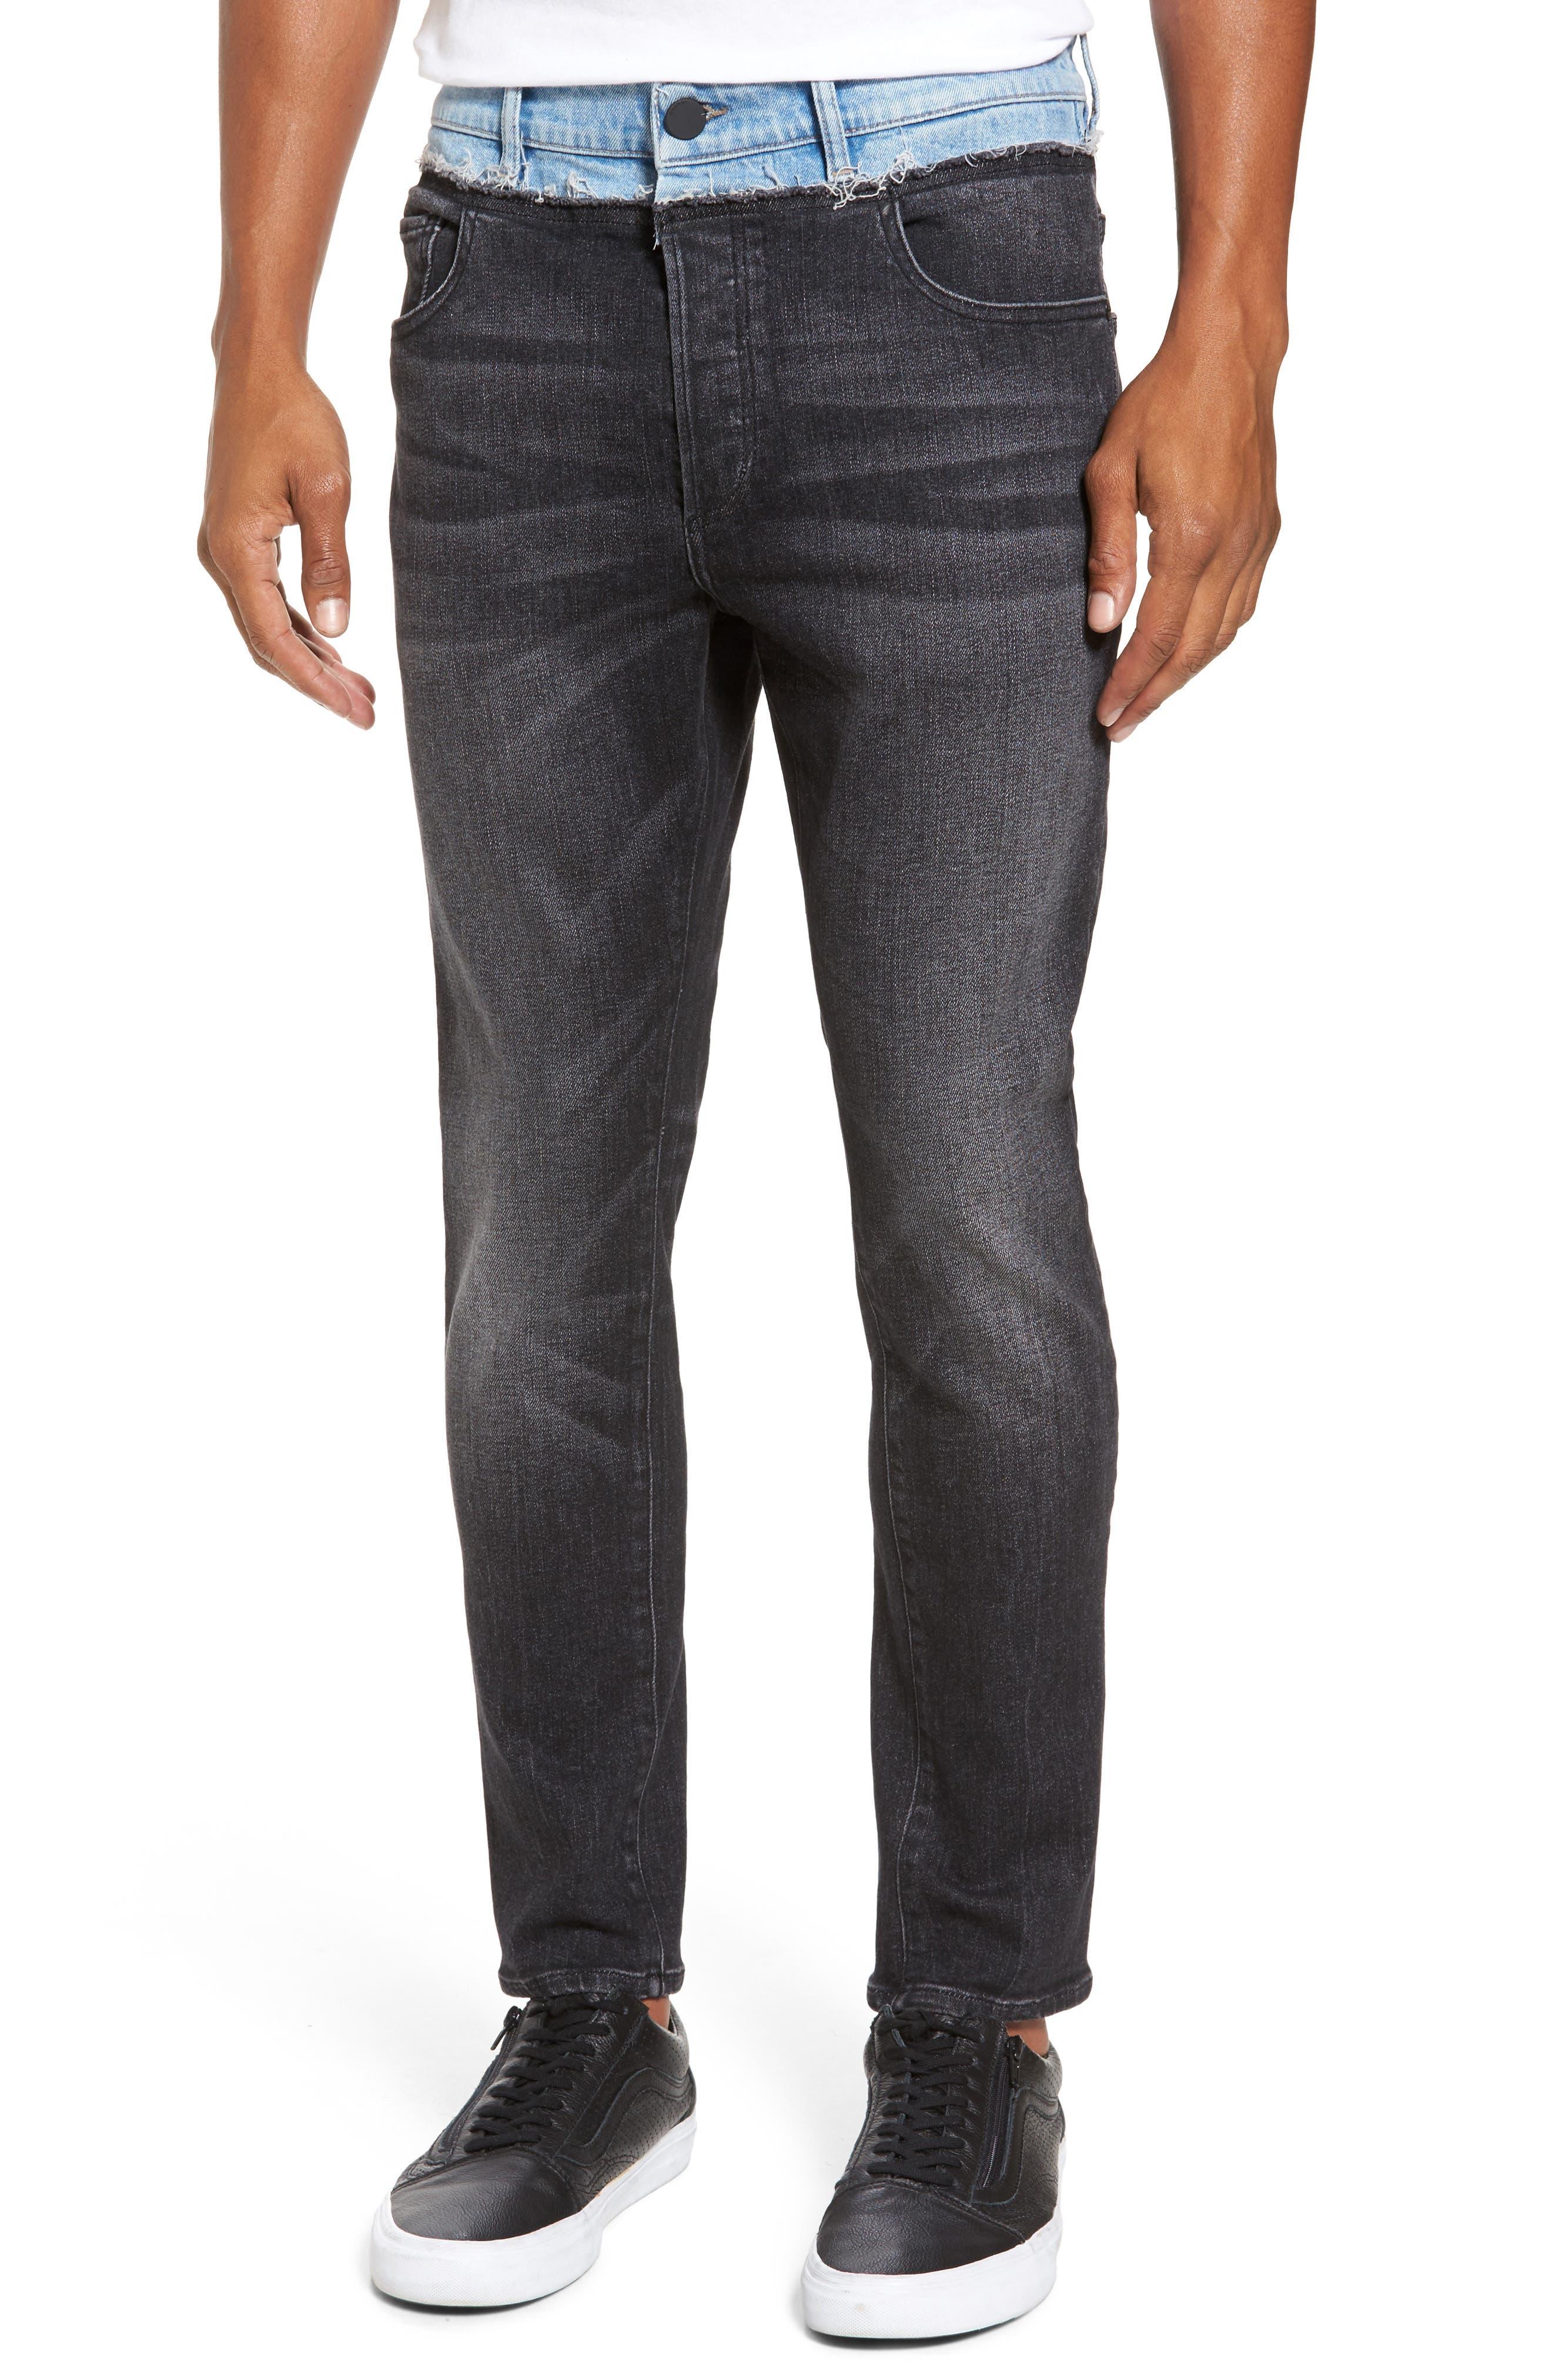 DL1961 Cooper Slouchy Skinny Jeans (Vapor)